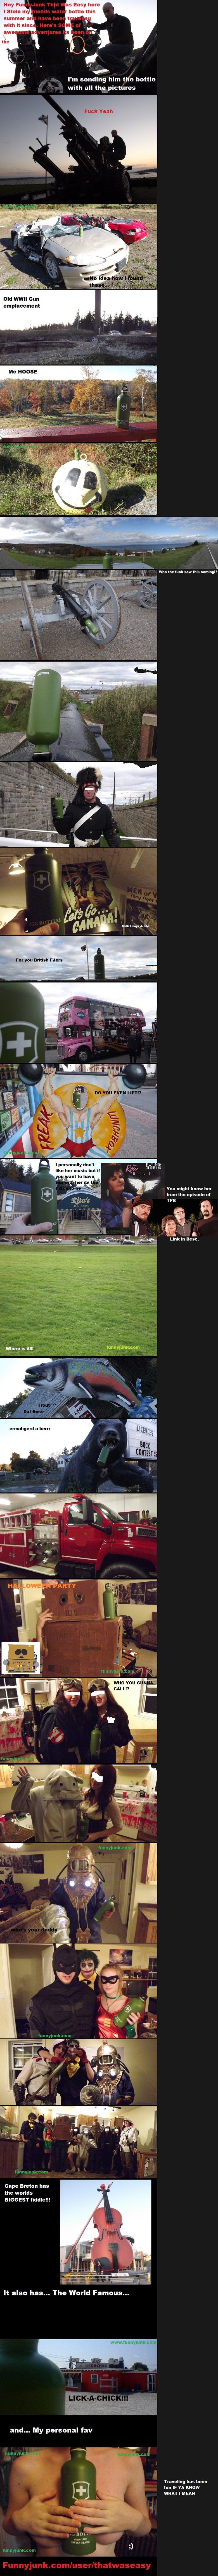 ADVENTURE!!! (check first comment). Rita MacNeil on Trailer Park Boys >> youtube.com/watch?v=KeKN1aQ7W3A do you like ZELDA!?! you do now! >>www.yout